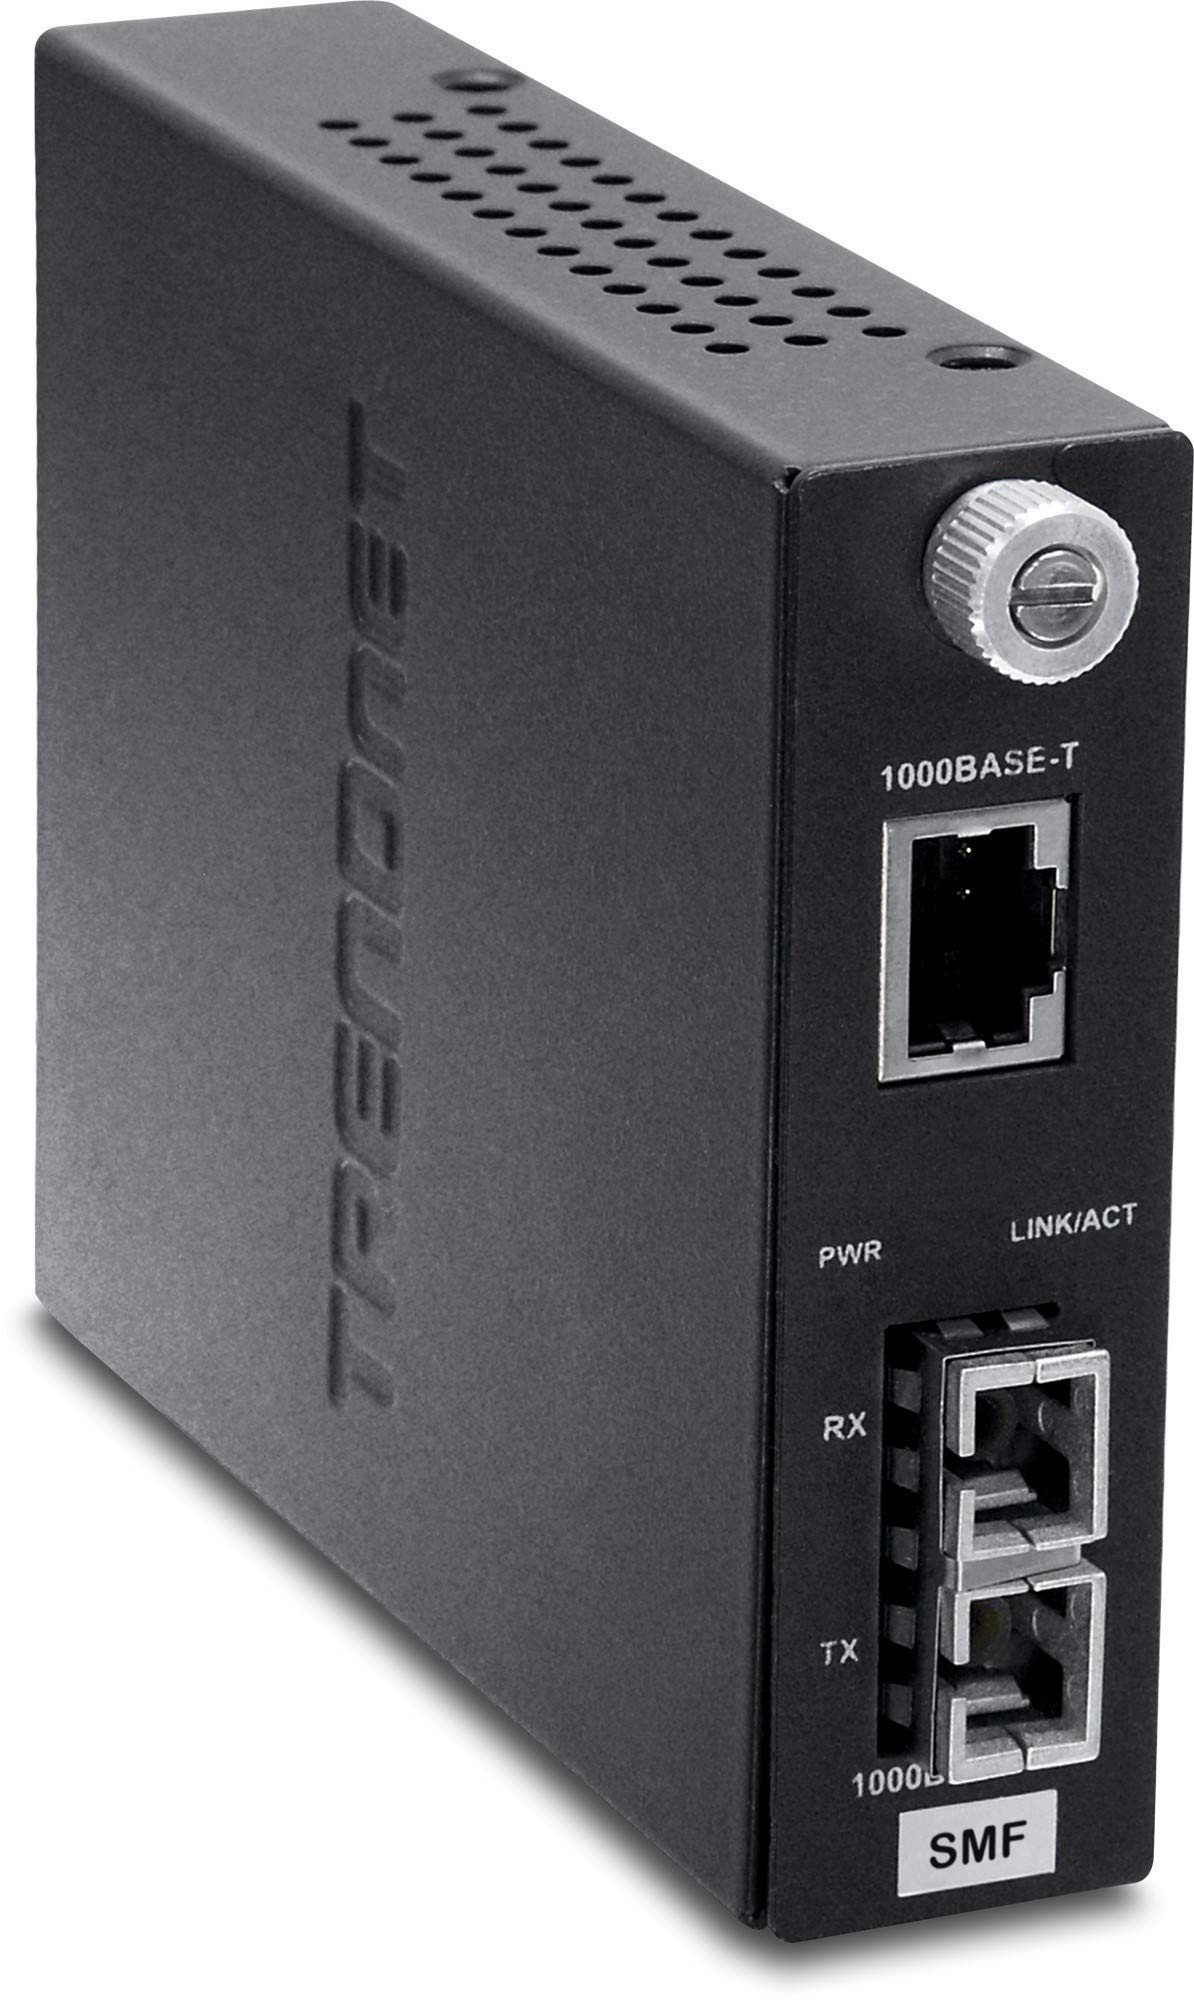 TRENDnet Intelligent 100Base-TX to 100Base-FX Dual Wavelength Single Mode SC Fiber Converter (20 km / 12.4 miles), Lifetime Protection, TFC-110S20D3i